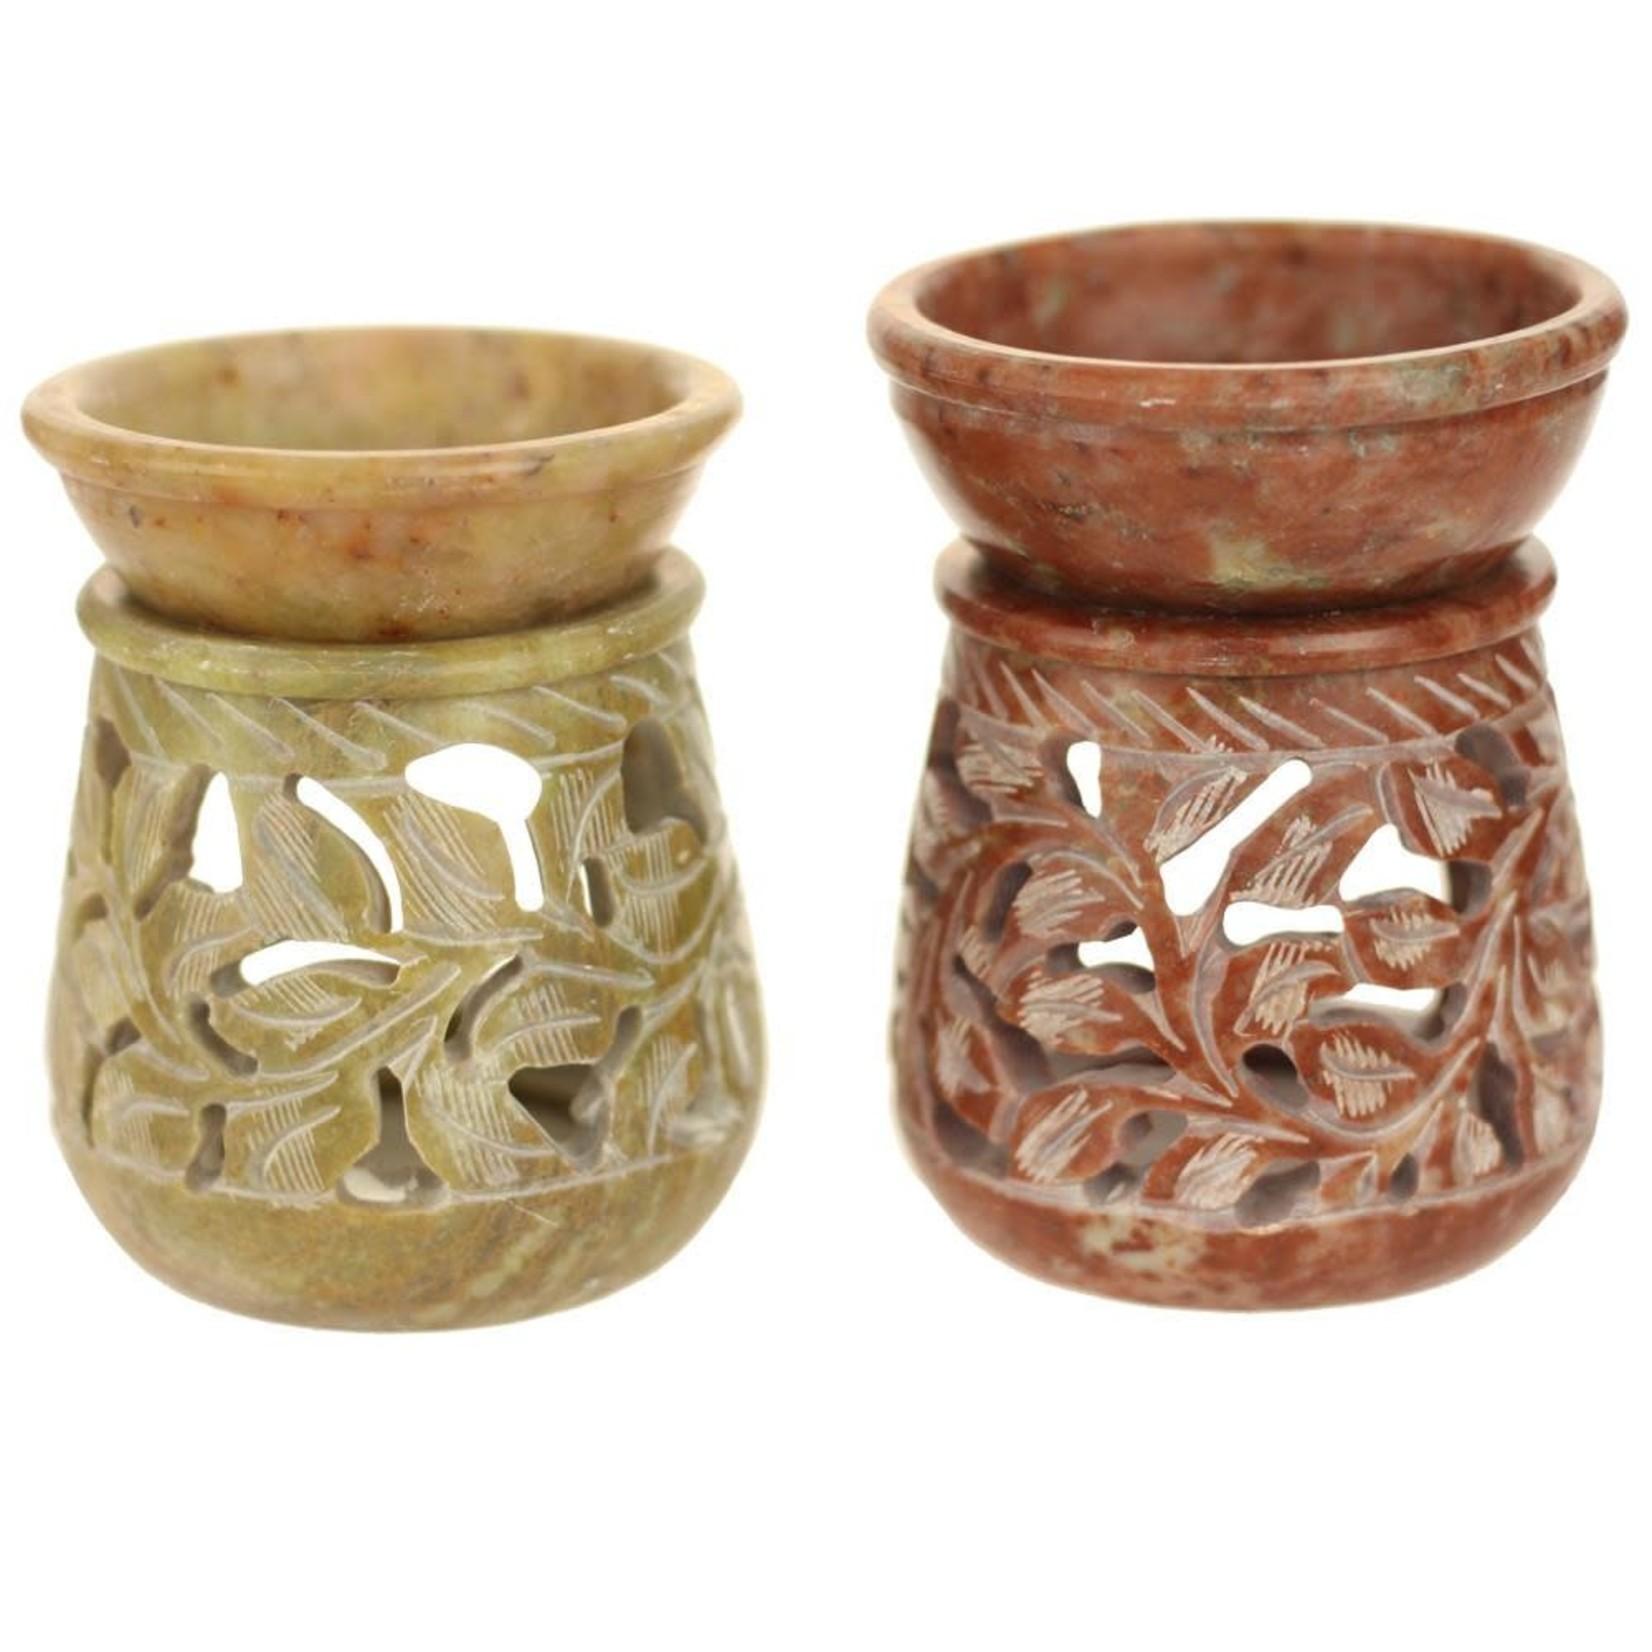 Prabhujis Gifts Soapstone Oil Burner Round Jali Small